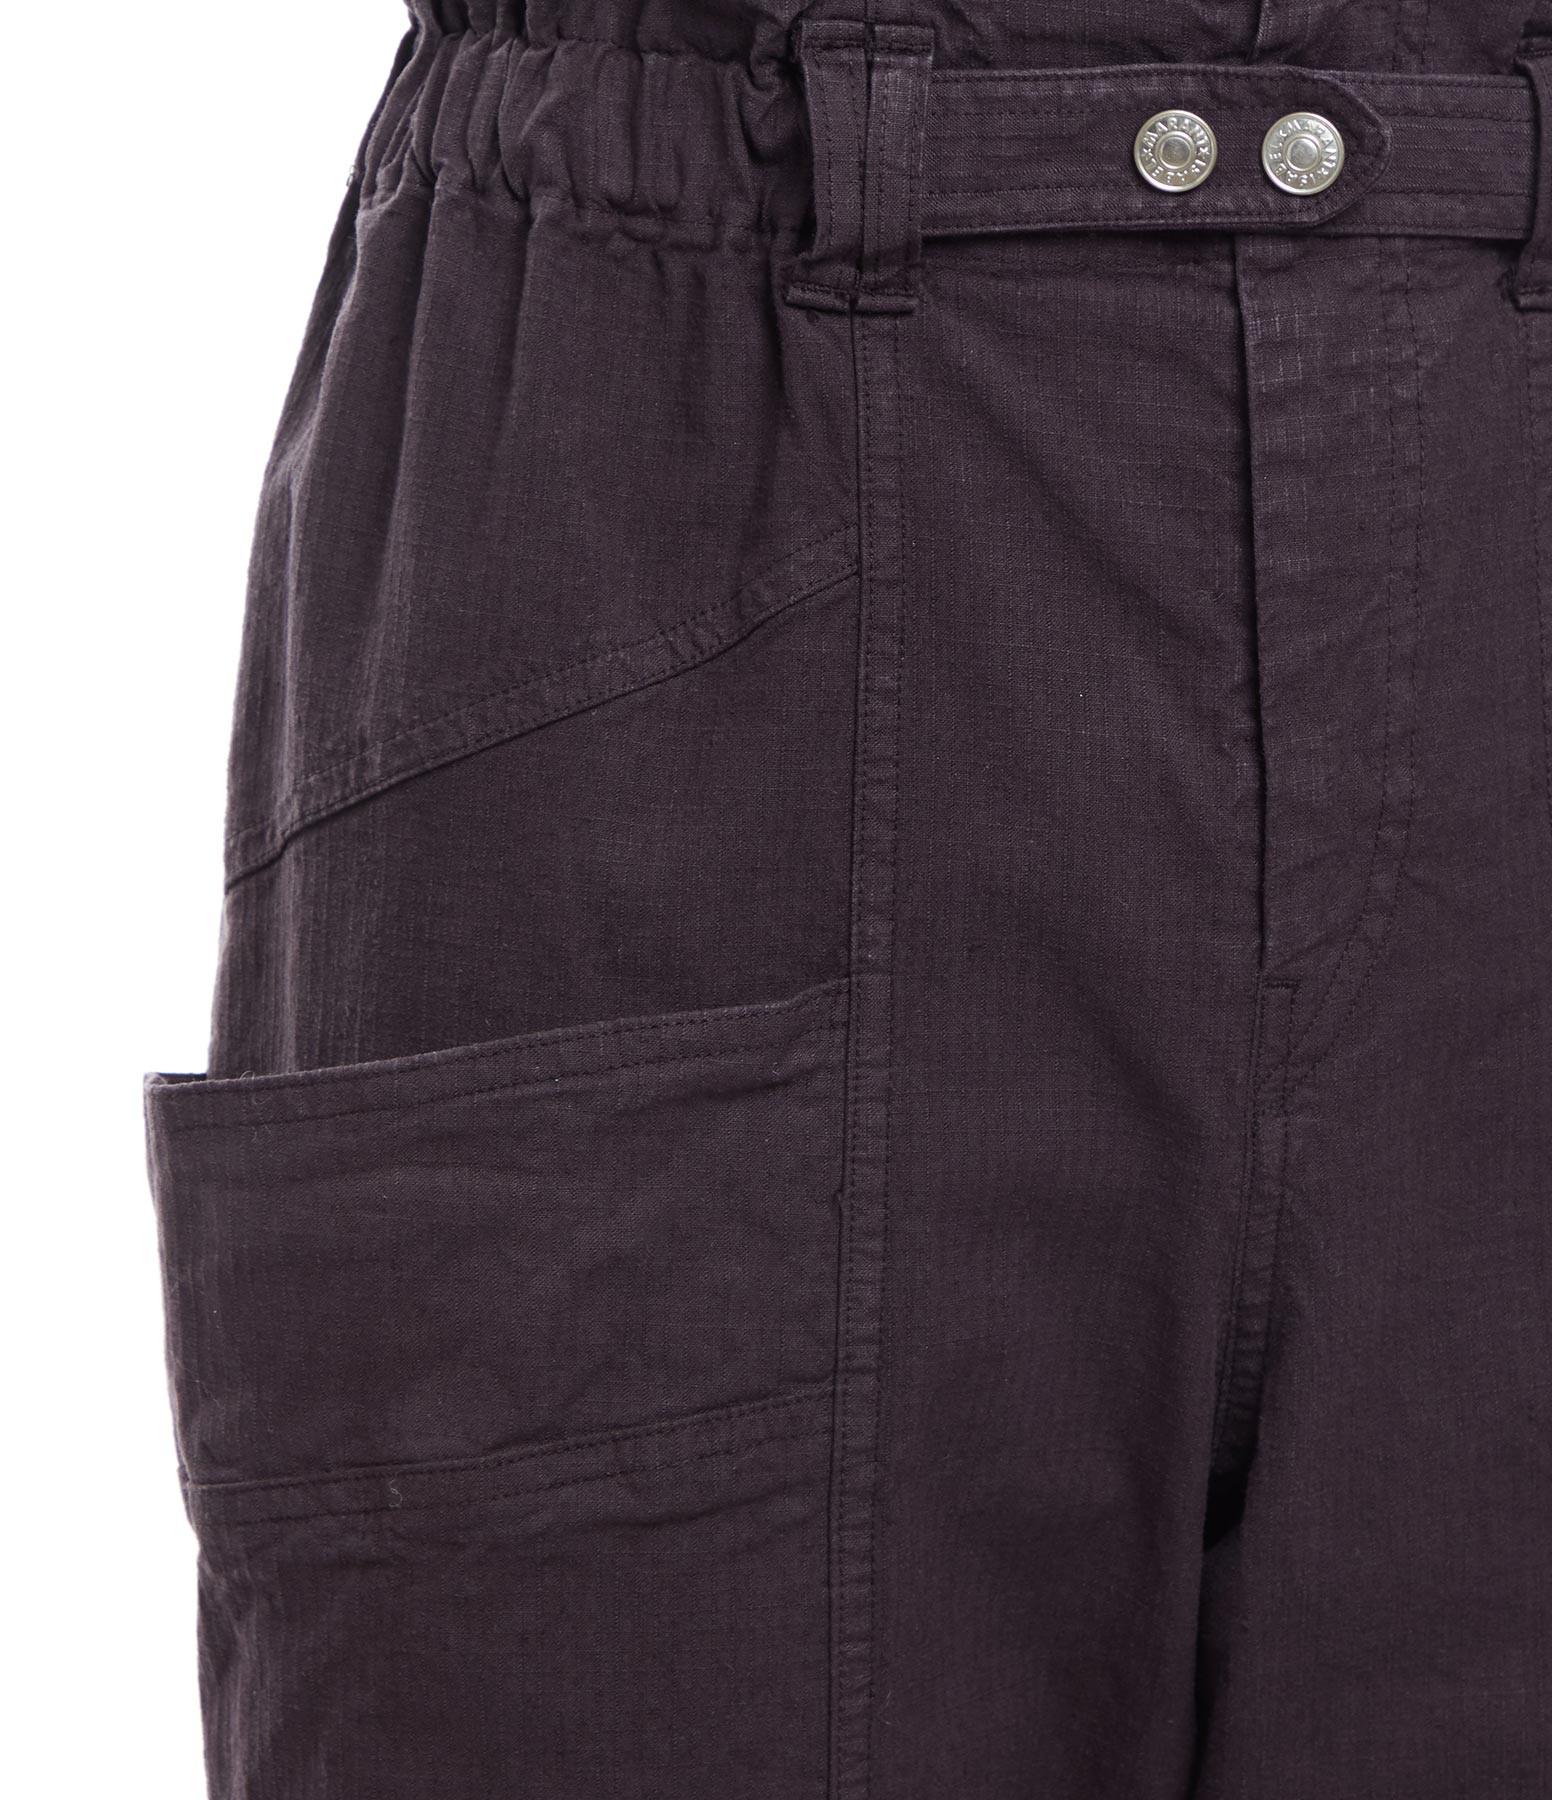 ISABEL MARANT - Pantalon Enucie Lin Coton Bleu Nuit